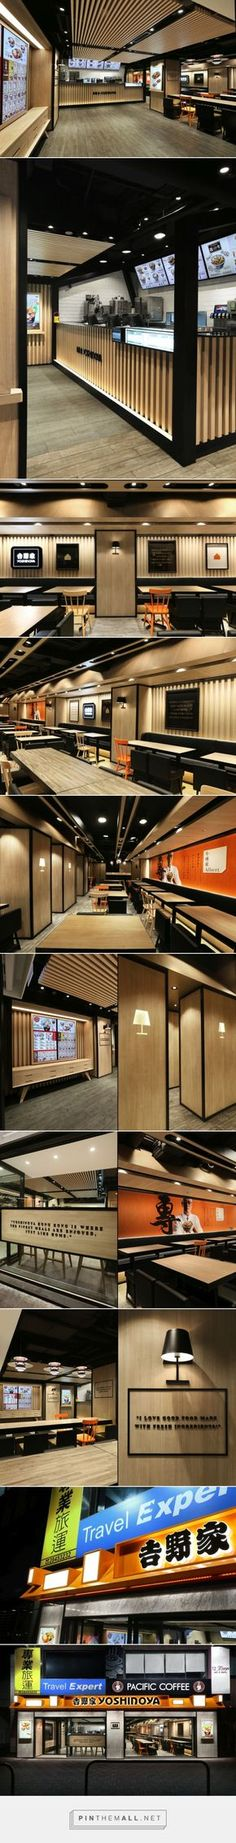 Yoshinoya Fast Food Restaurant by AS Design Service, Hong Kong » Retail Design Blog - created via https://pinthemall.net